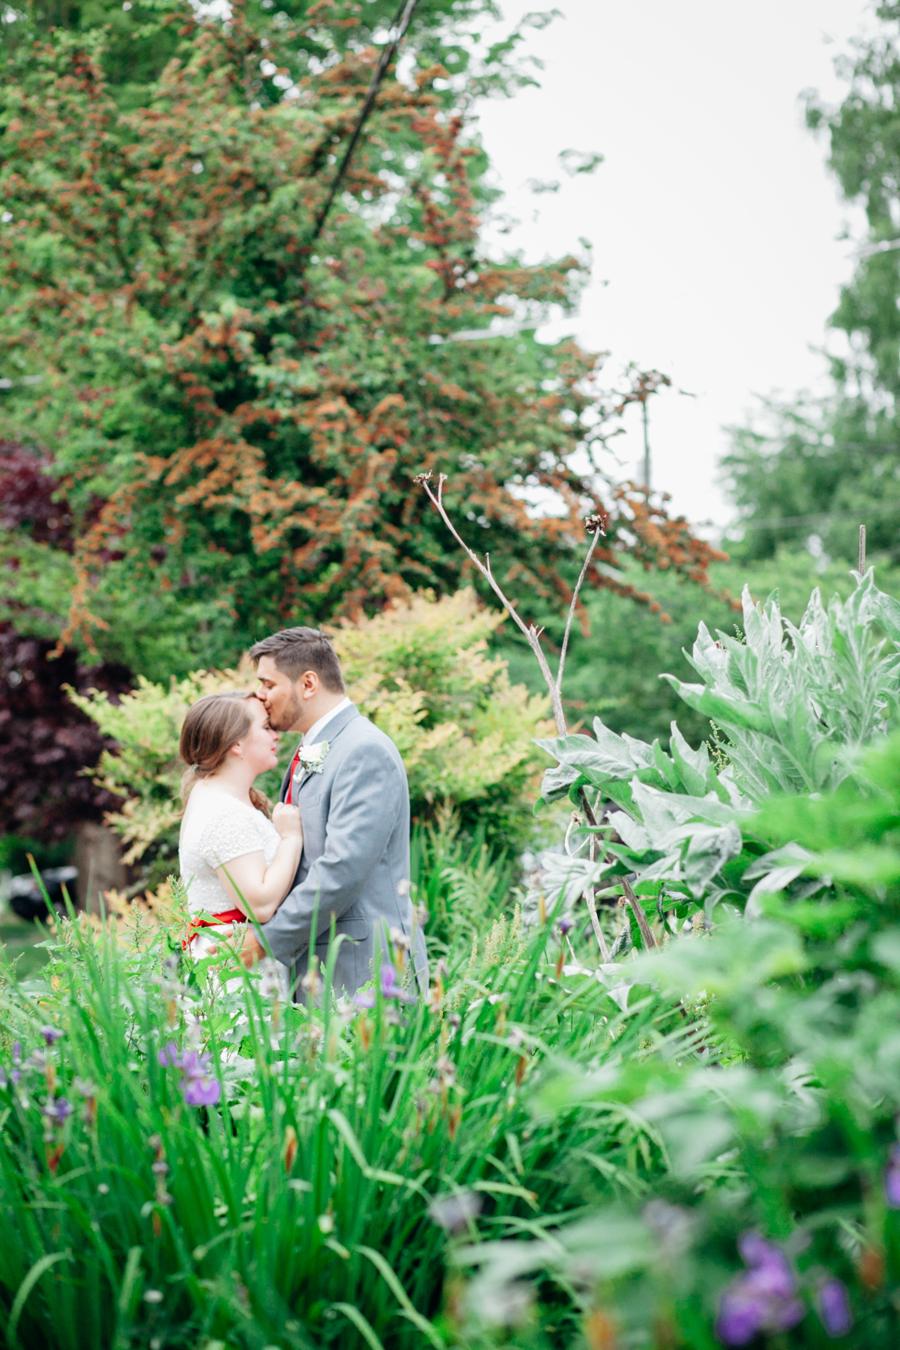 068-central-cinema-seattle-washington-wedding-kaheryn-moran-photography.jpg